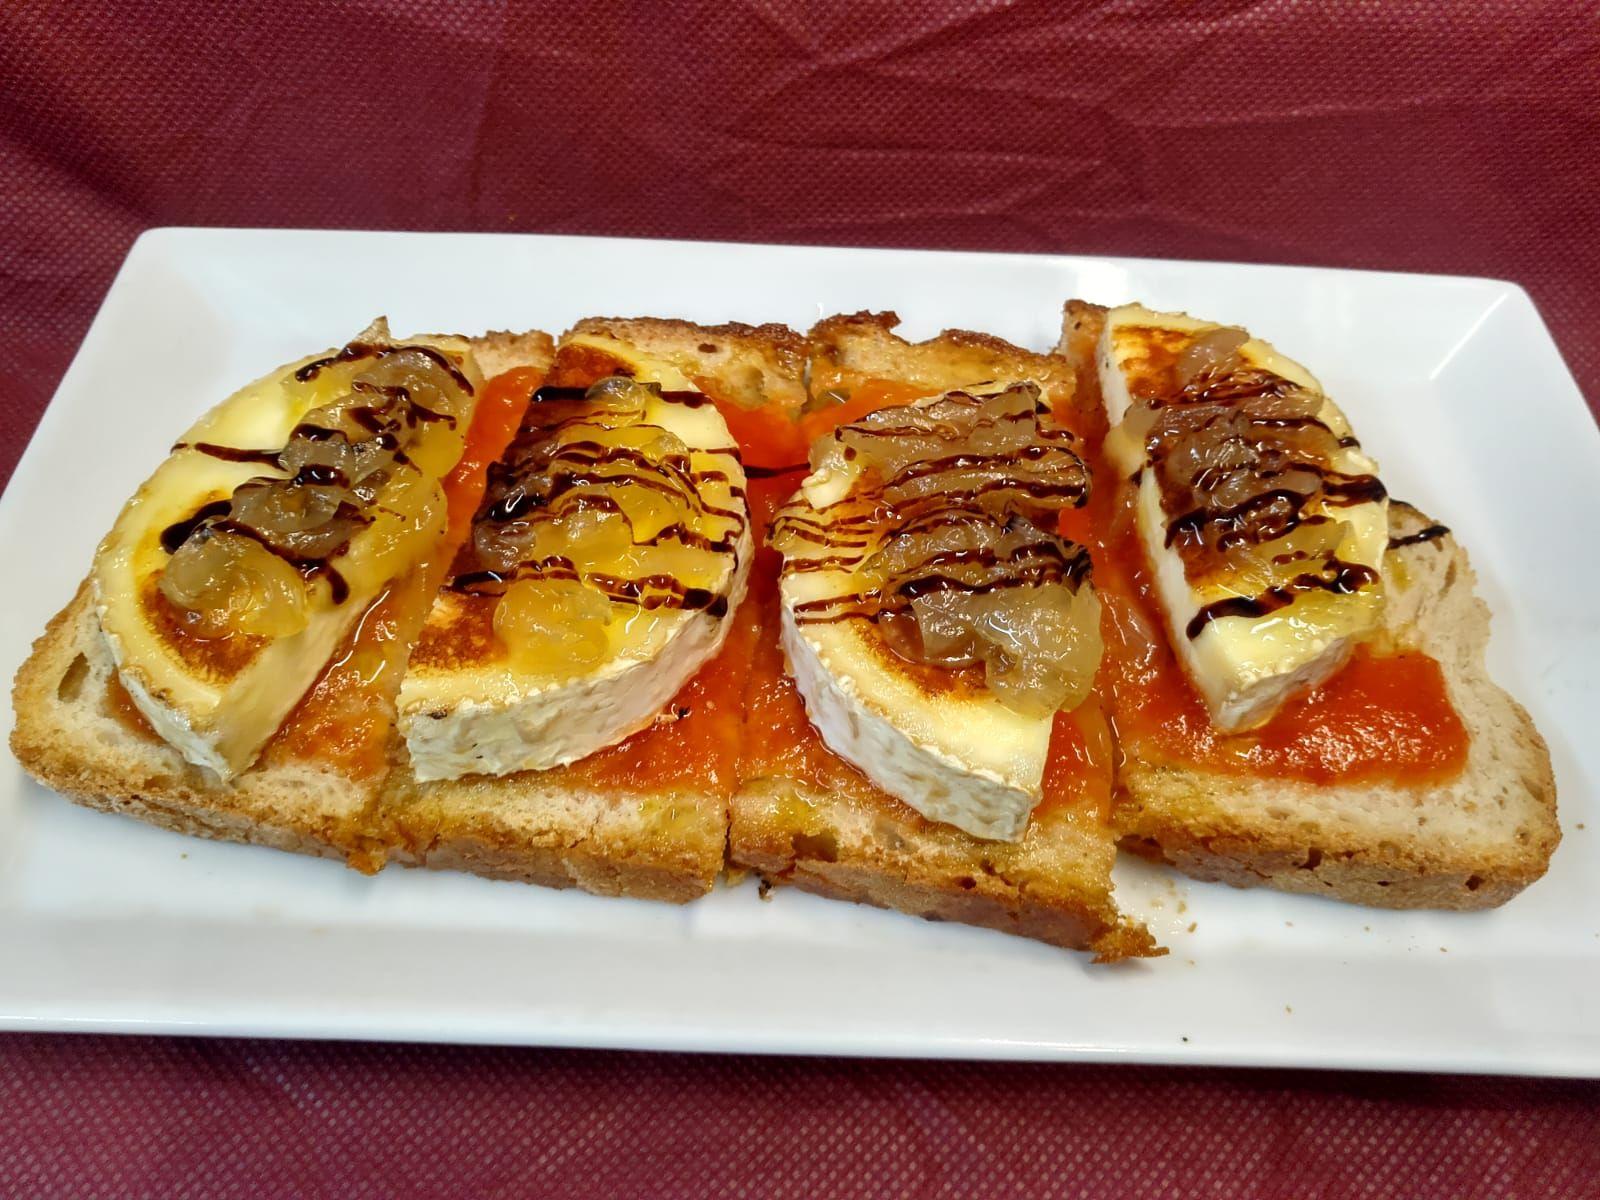 Picture 8 of Cocina creativa in As Lagoas | Nova Lua Chea Vinoteca